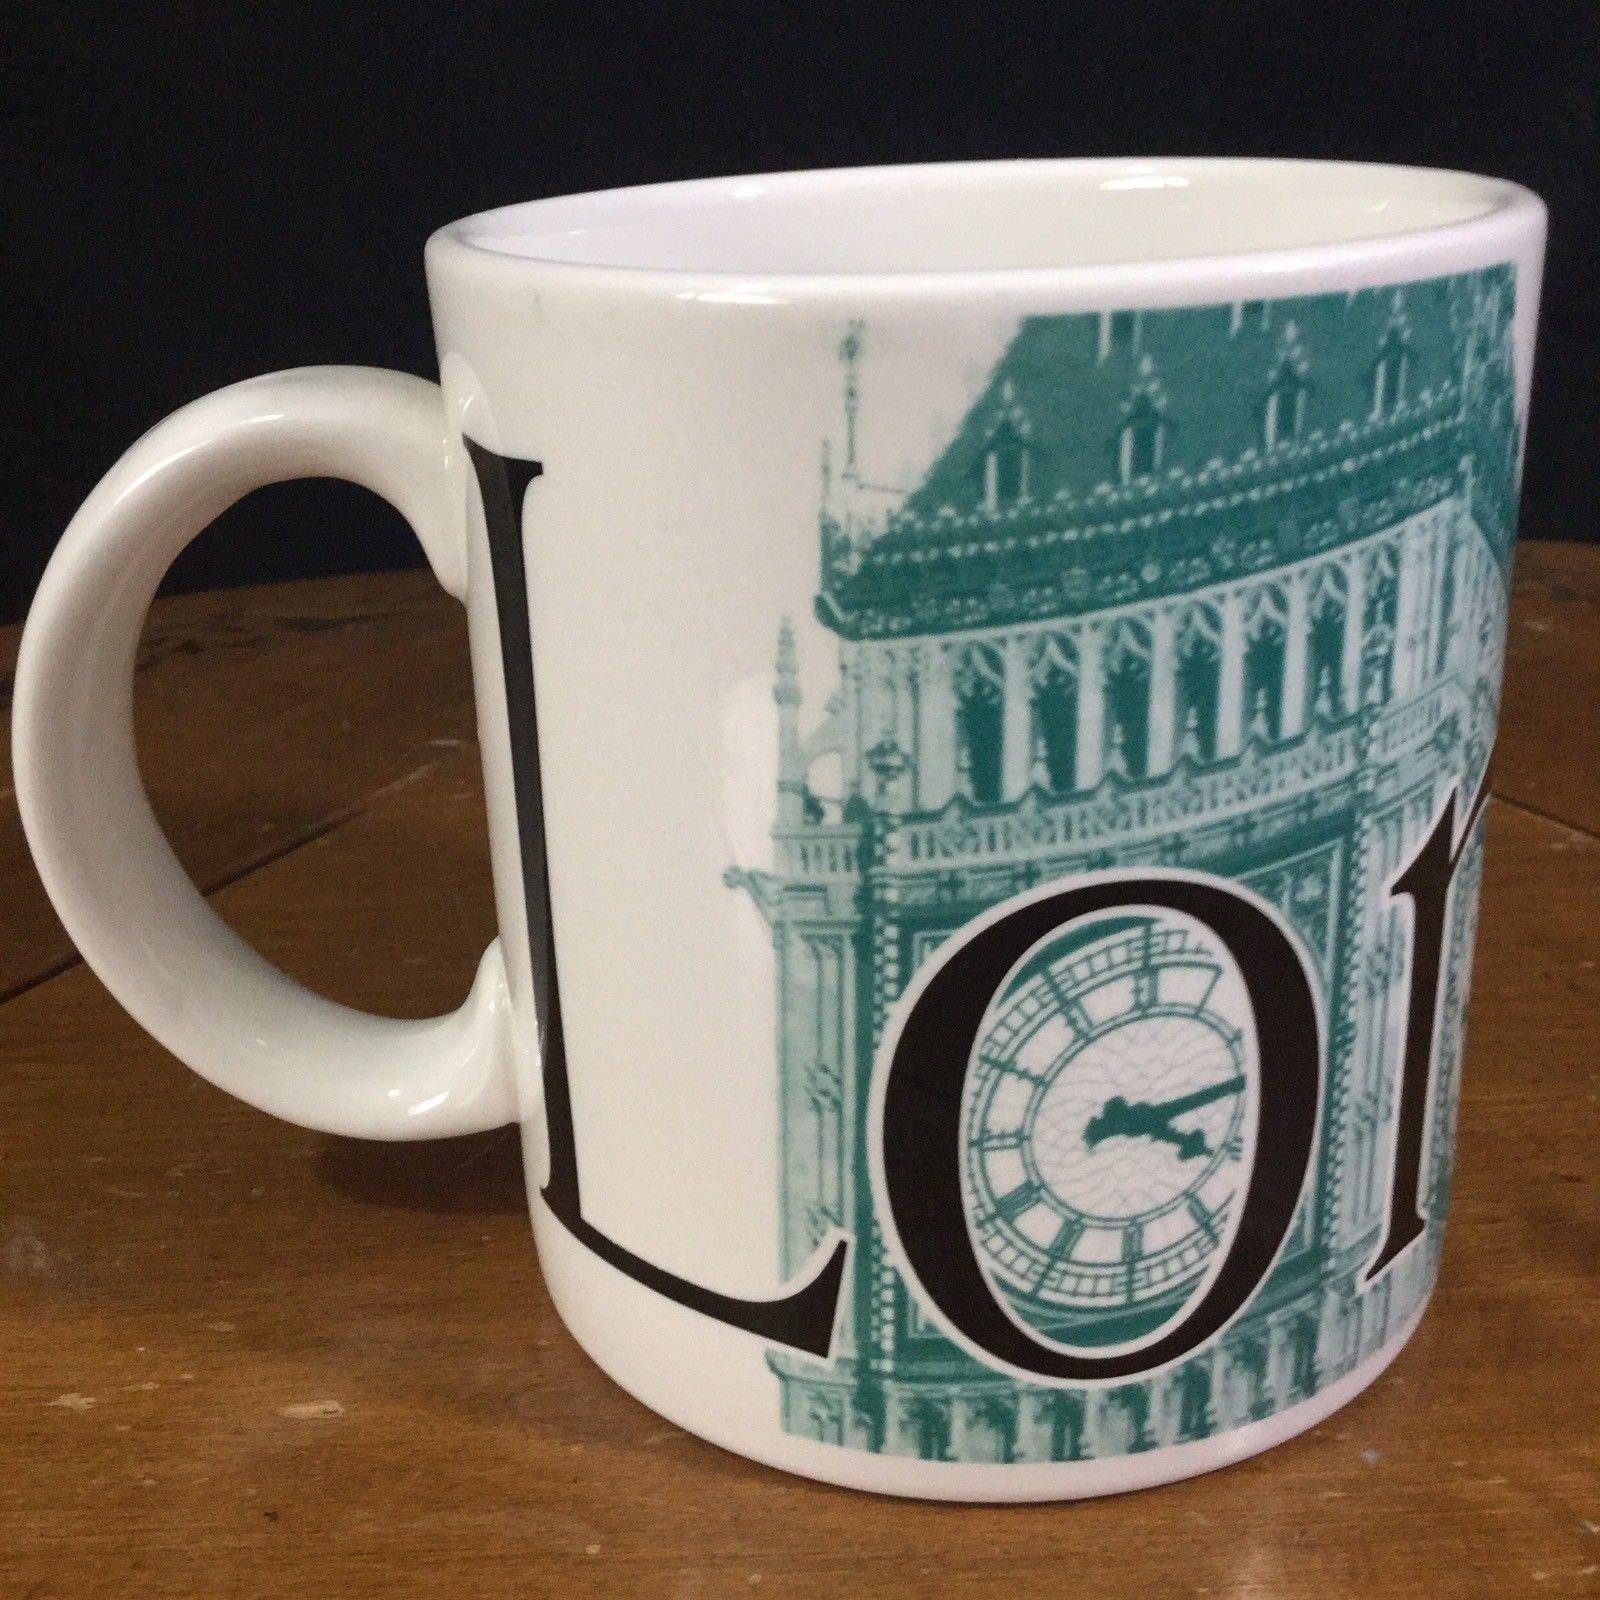 Calmly Starbucks City Coffee Mug London Big Ben Similar Items 20 Oz Coffee Mug Target 20 Oz Insulated Coffee Mug inspiration 20 Oz Coffee Mug